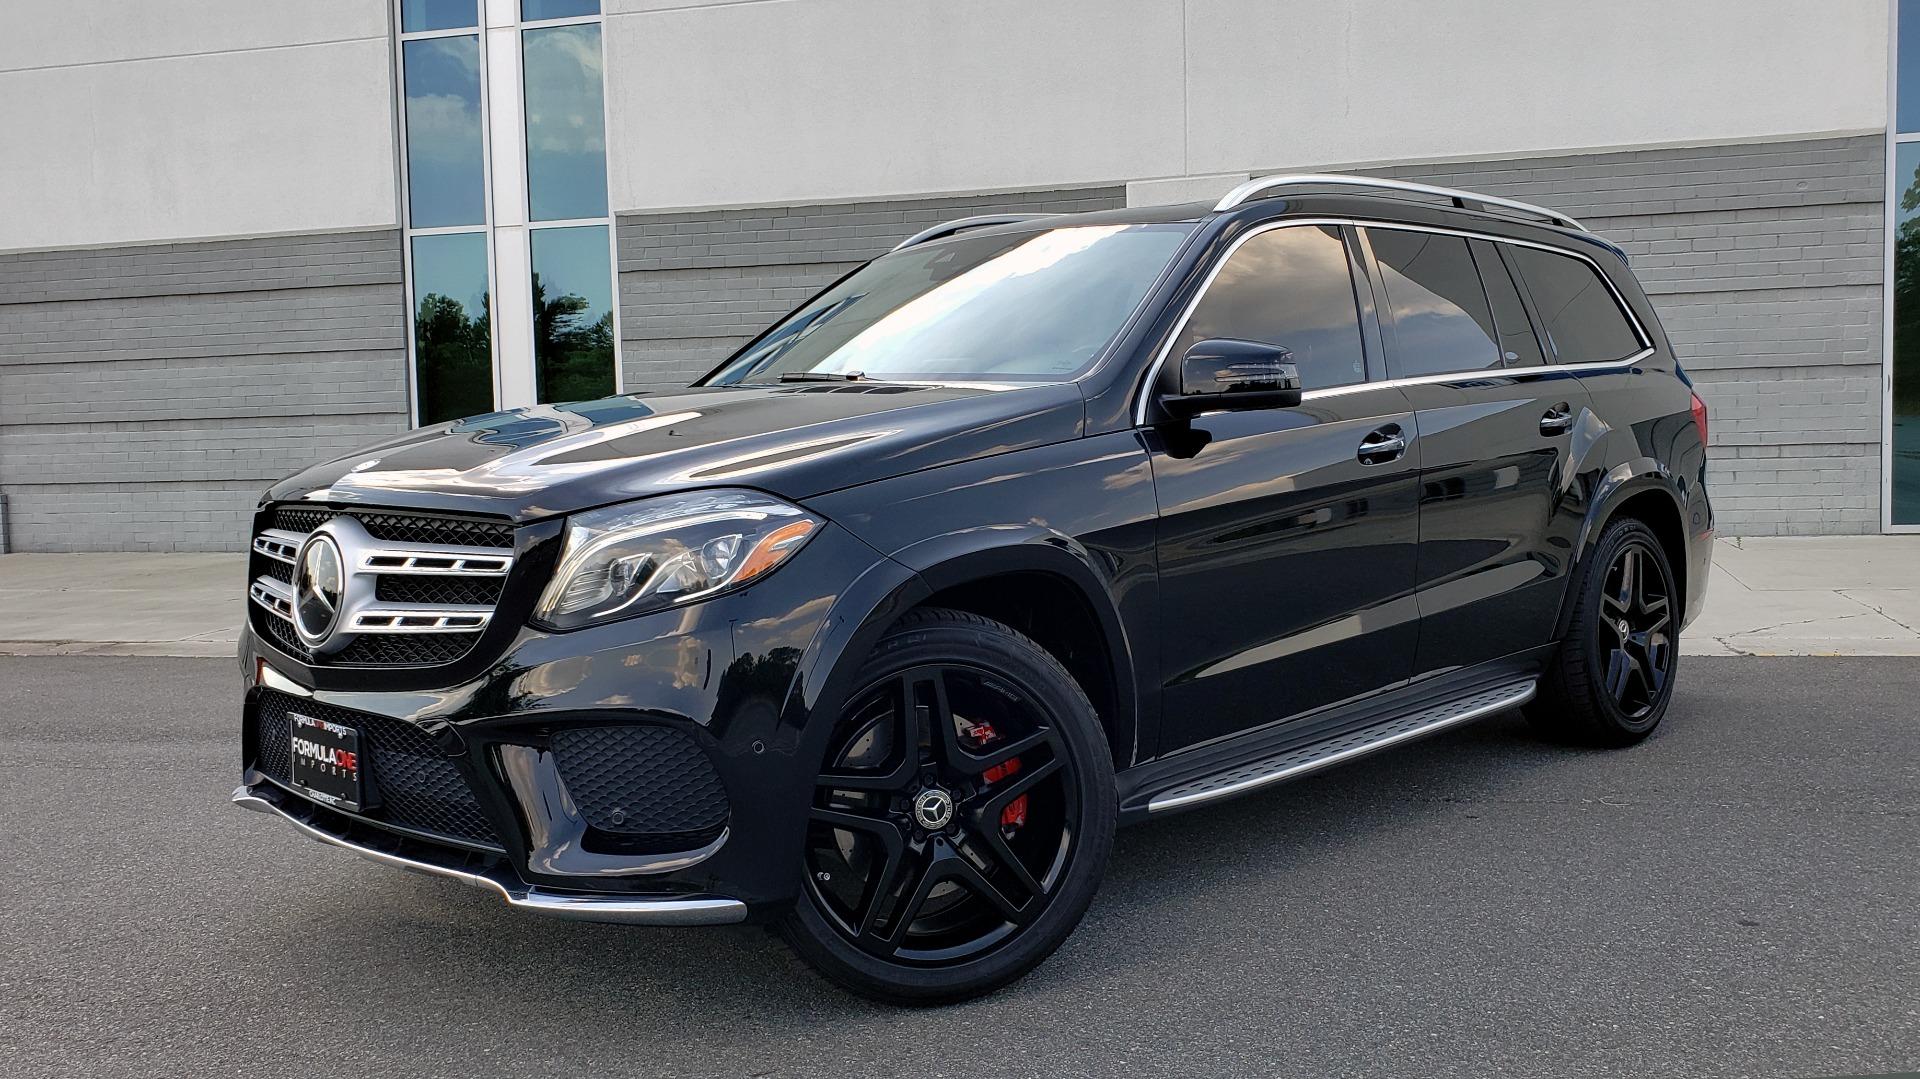 Used 2017 Mercedes-Benz GLS GLS 550 for sale Sold at Formula Imports in Charlotte NC 28227 1